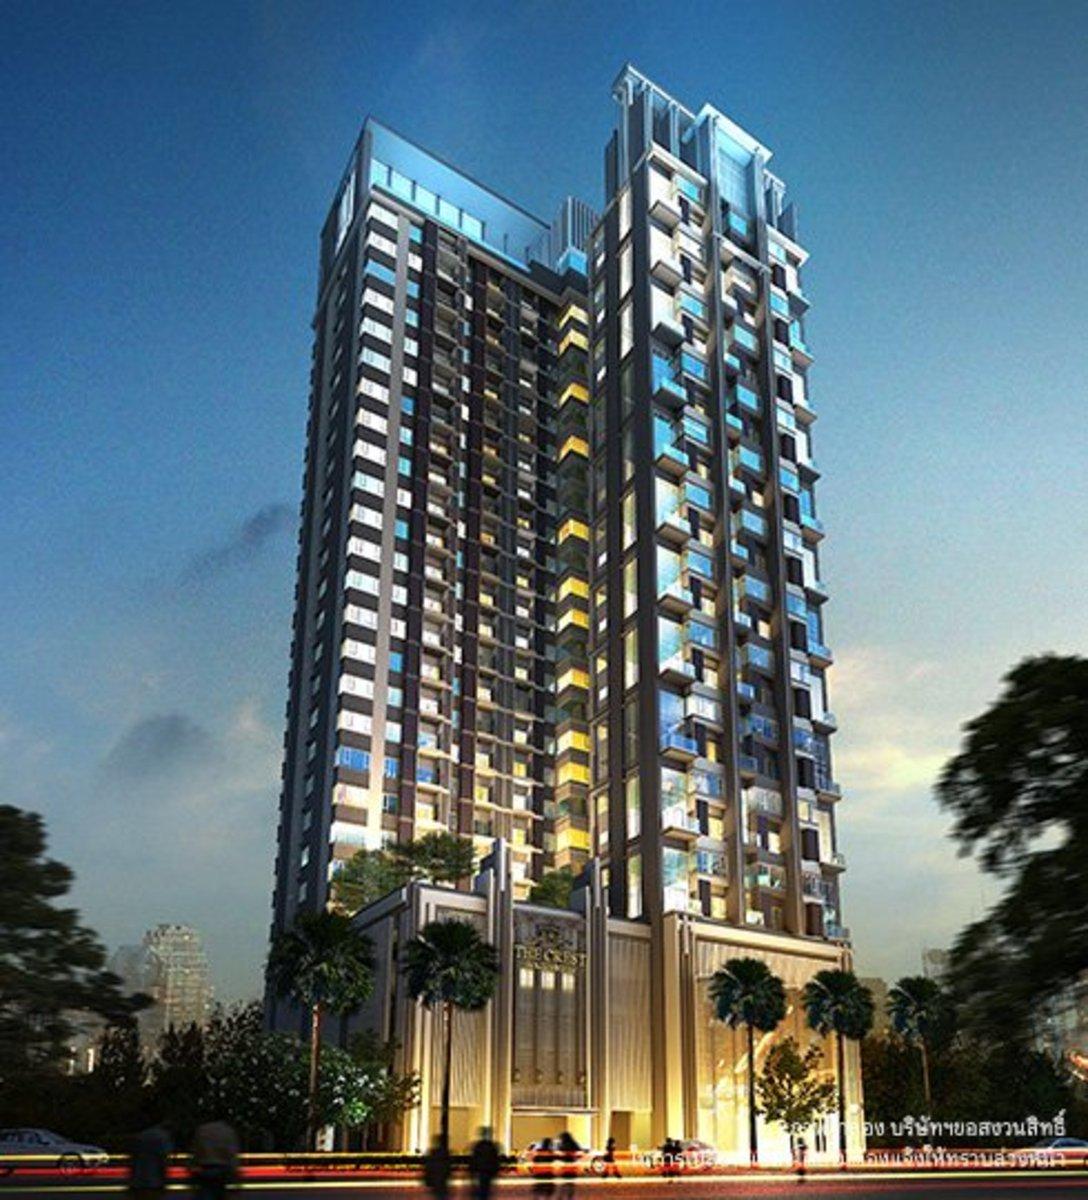 For SaleCondoSukhumvit, Asoke, Thonglor : Urgent sale The Crest Sukhumvit 34 1 bedroom 1 bathroom 35.78 sq m, high floor, fully furnished room, only 17x, xxx / sq m, call 065-979-5246 postter